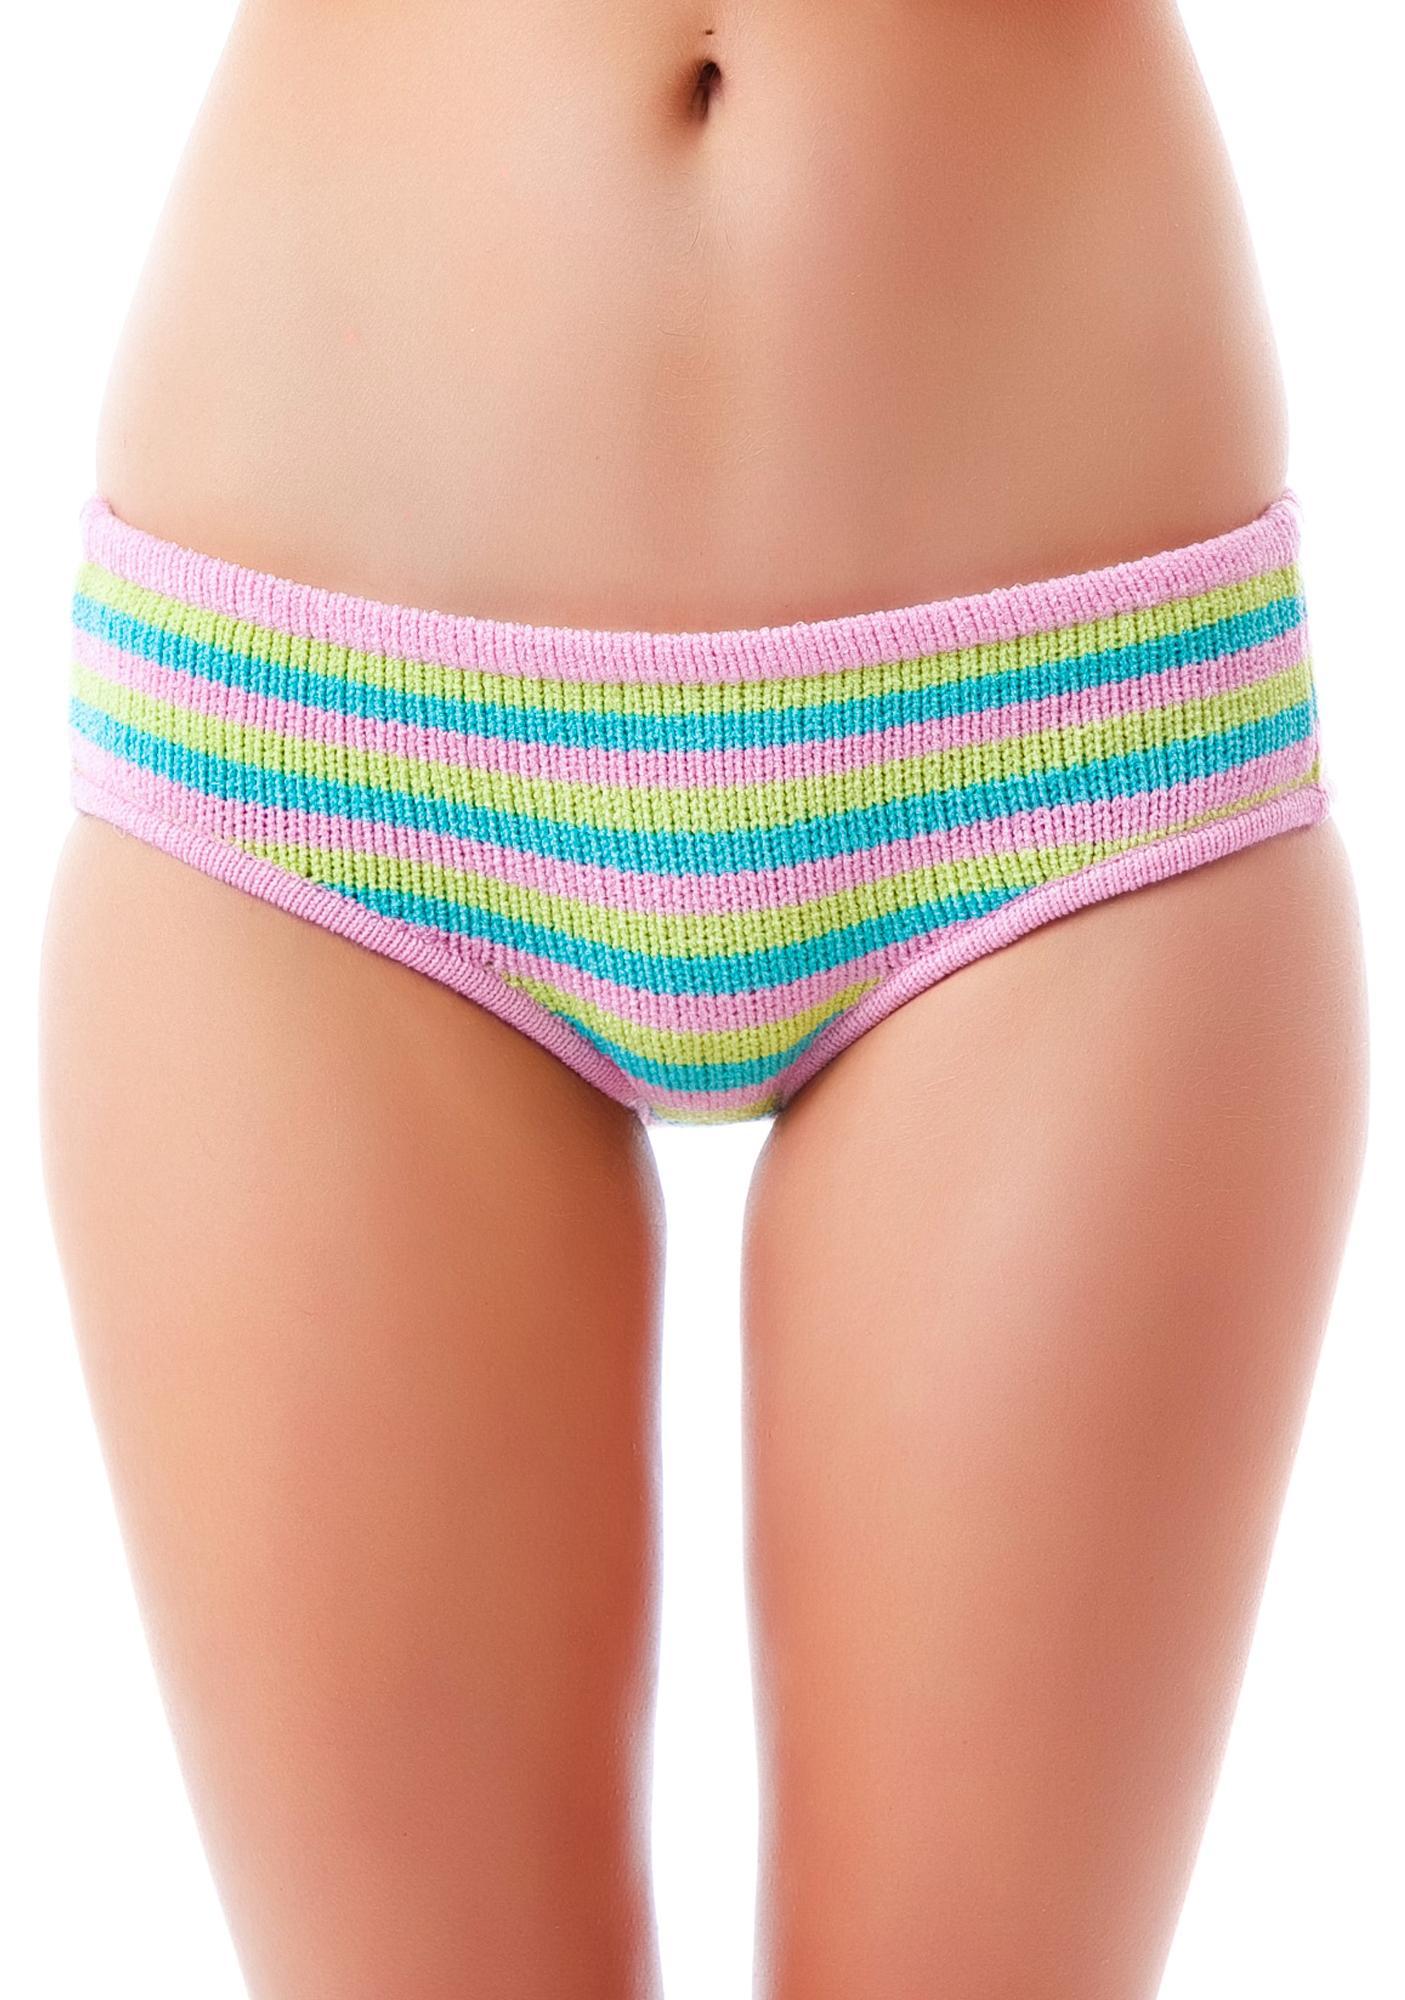 Knitty Kitty Candy Stripe Panty